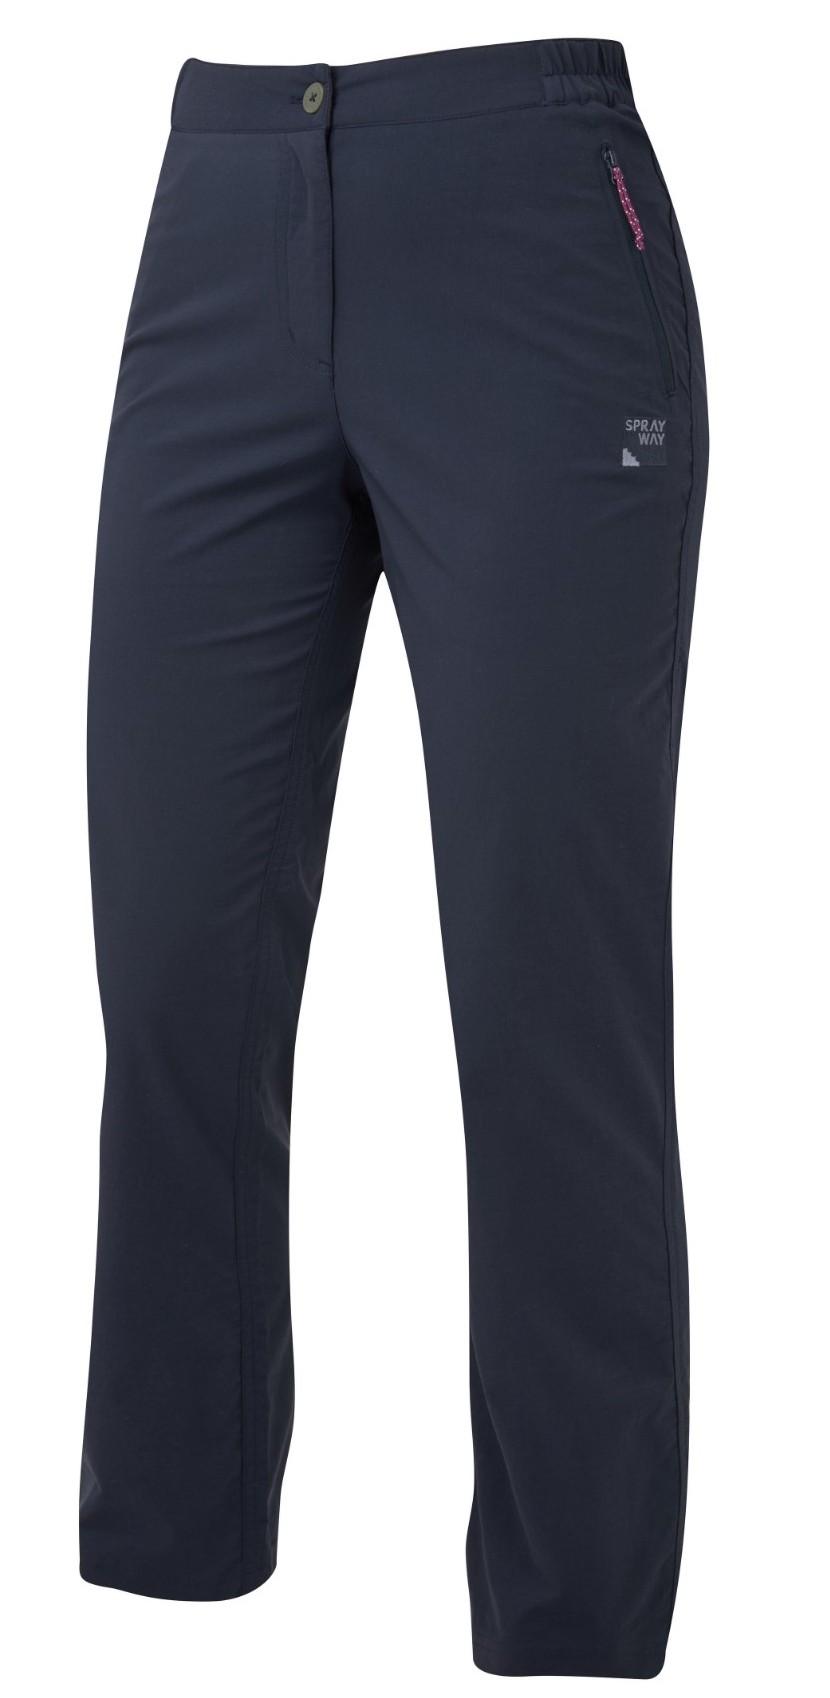 Sprayway Escape Pants Womens - Short Leg Length